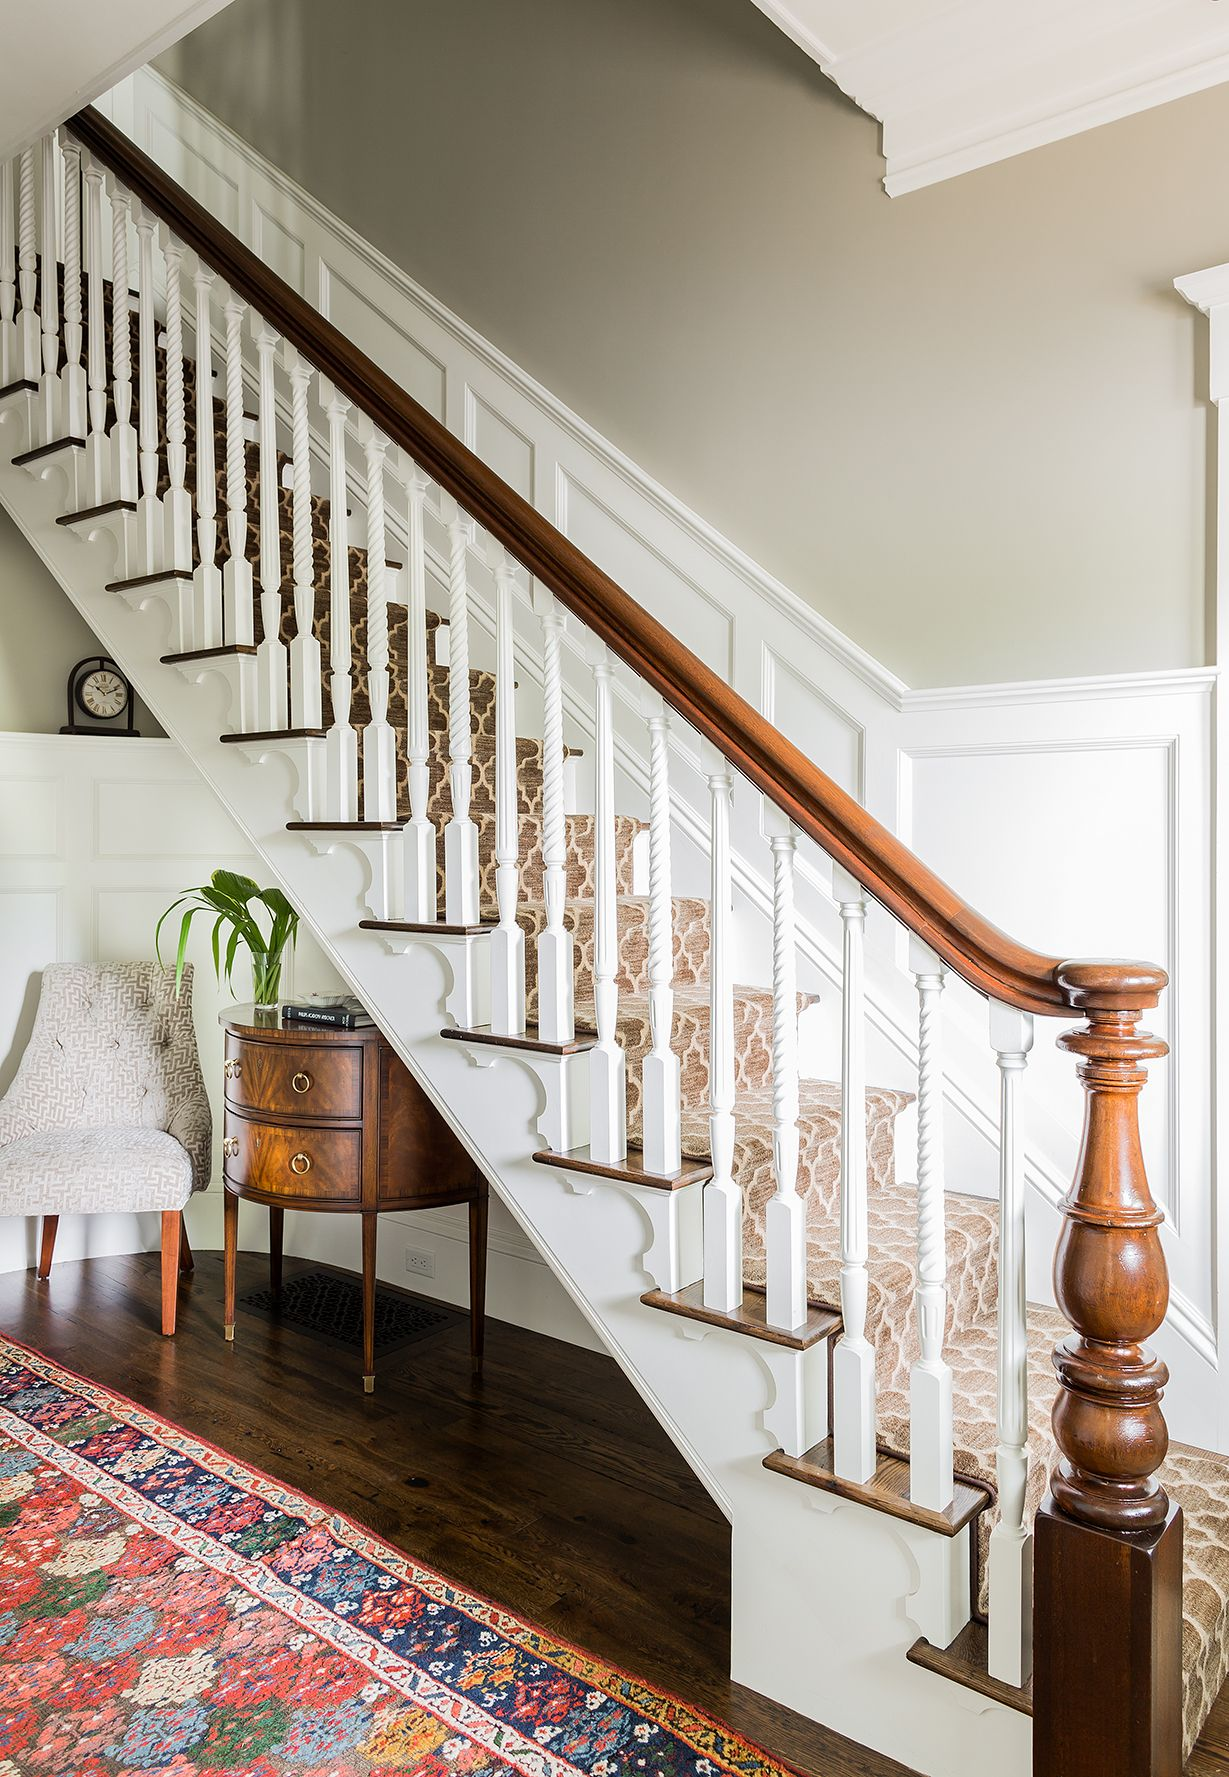 Project Before After Historic Home Renovation Howell Custom | Sweet Home 3D Custom Stairs | Mural | Mezzanine | Interior Design | Mezzanine Floor | 3D Models